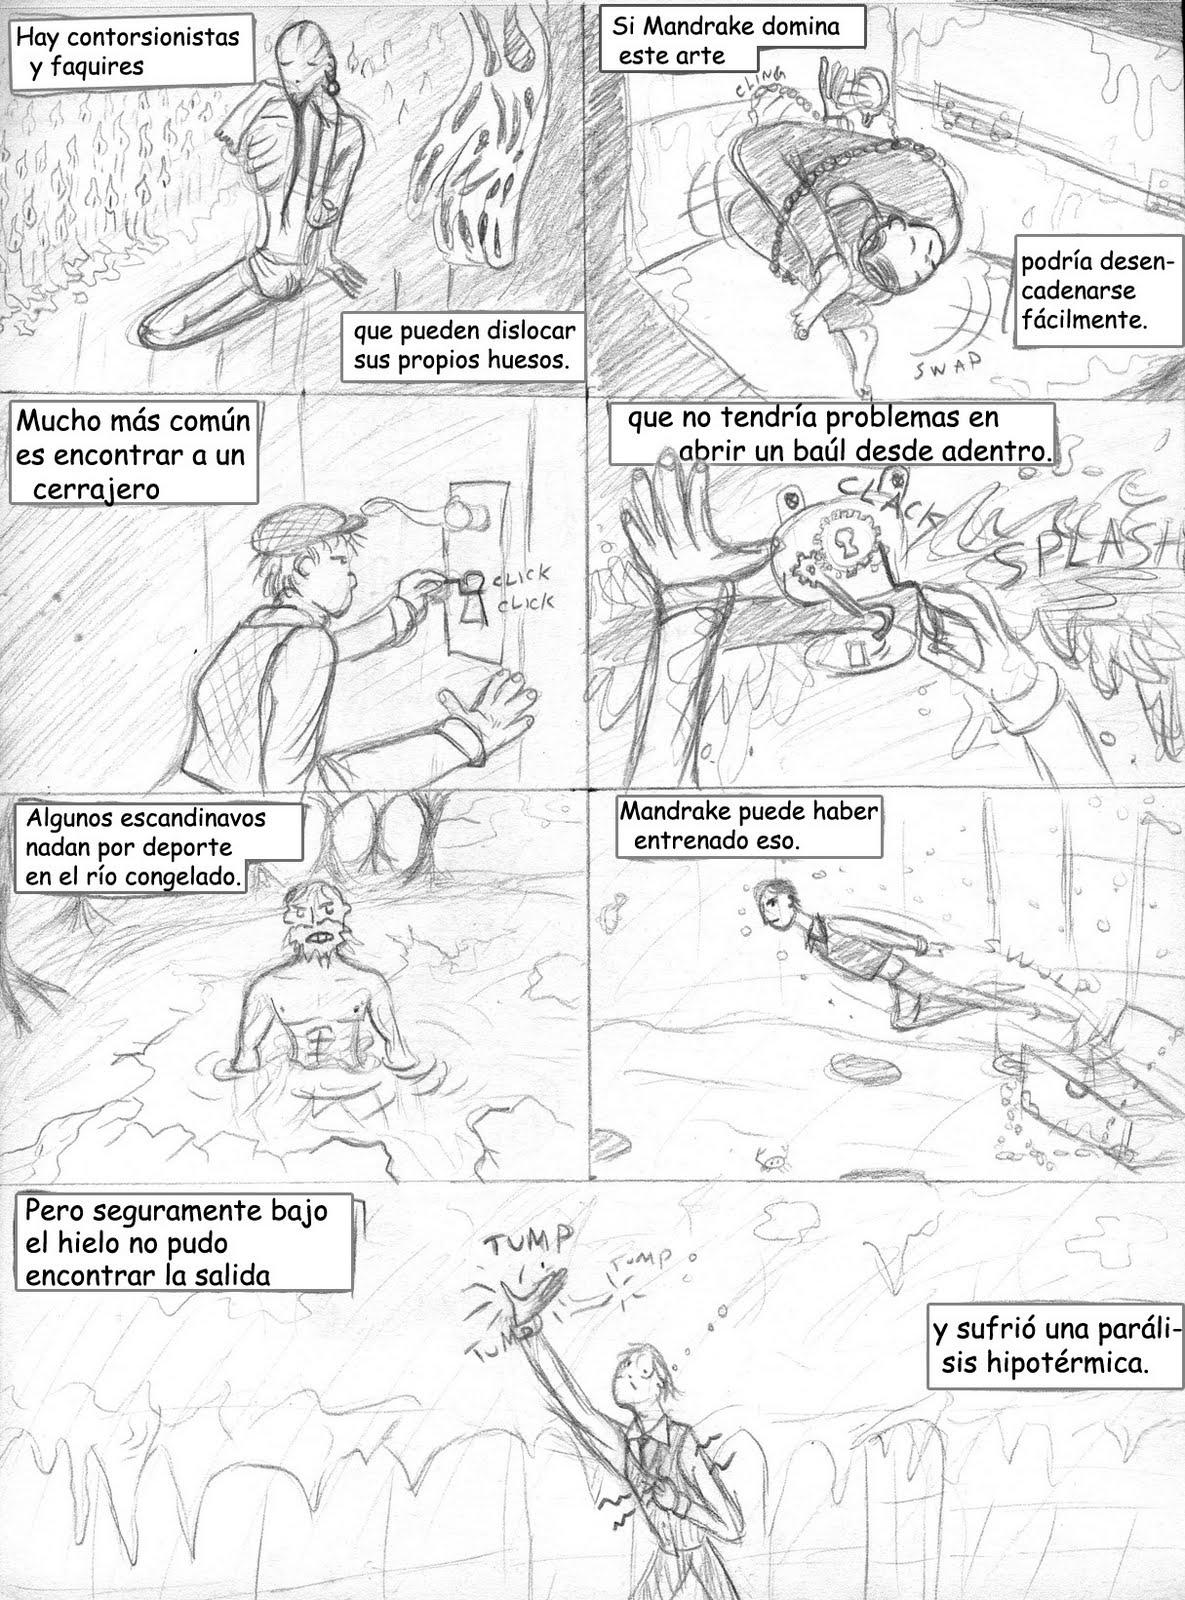 Glauconar Yue El Mago Mandrake